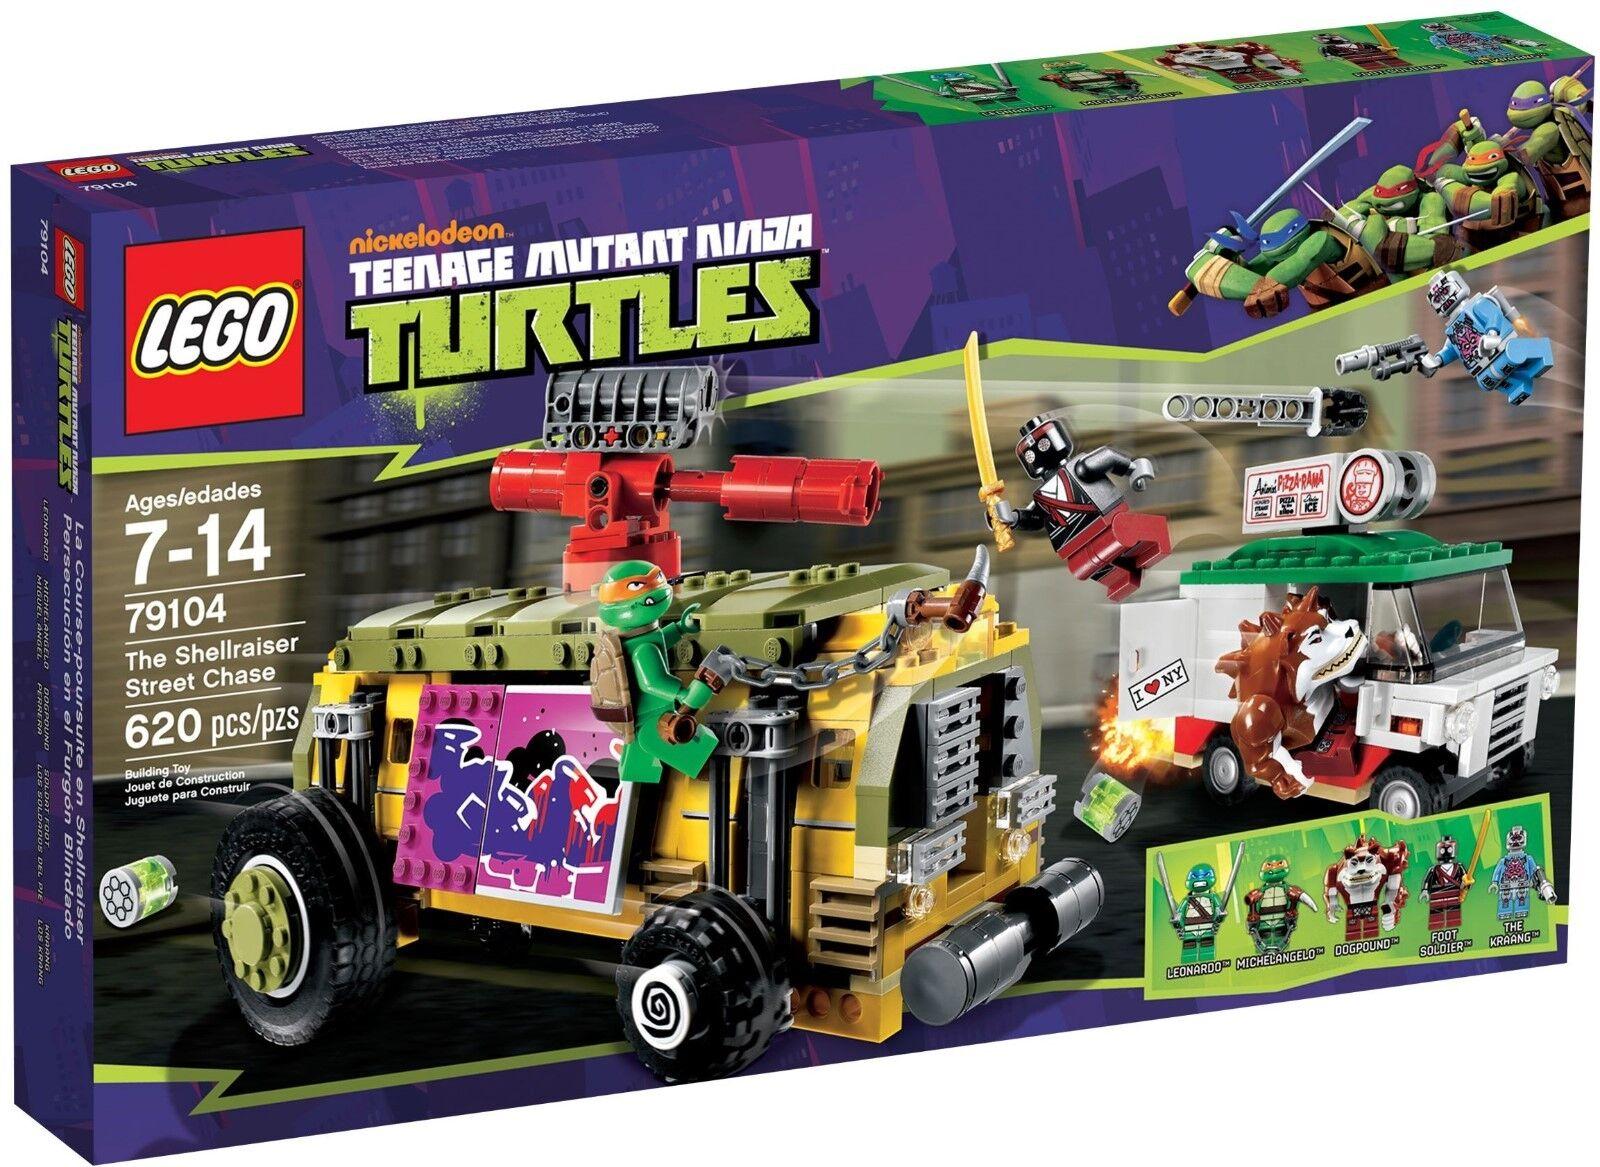 LEGO 79104 Ninja Turtles  SHELLRAISER STREET CHASE  Rare Rare Rare DOGPOUND New Sealed Box 501291